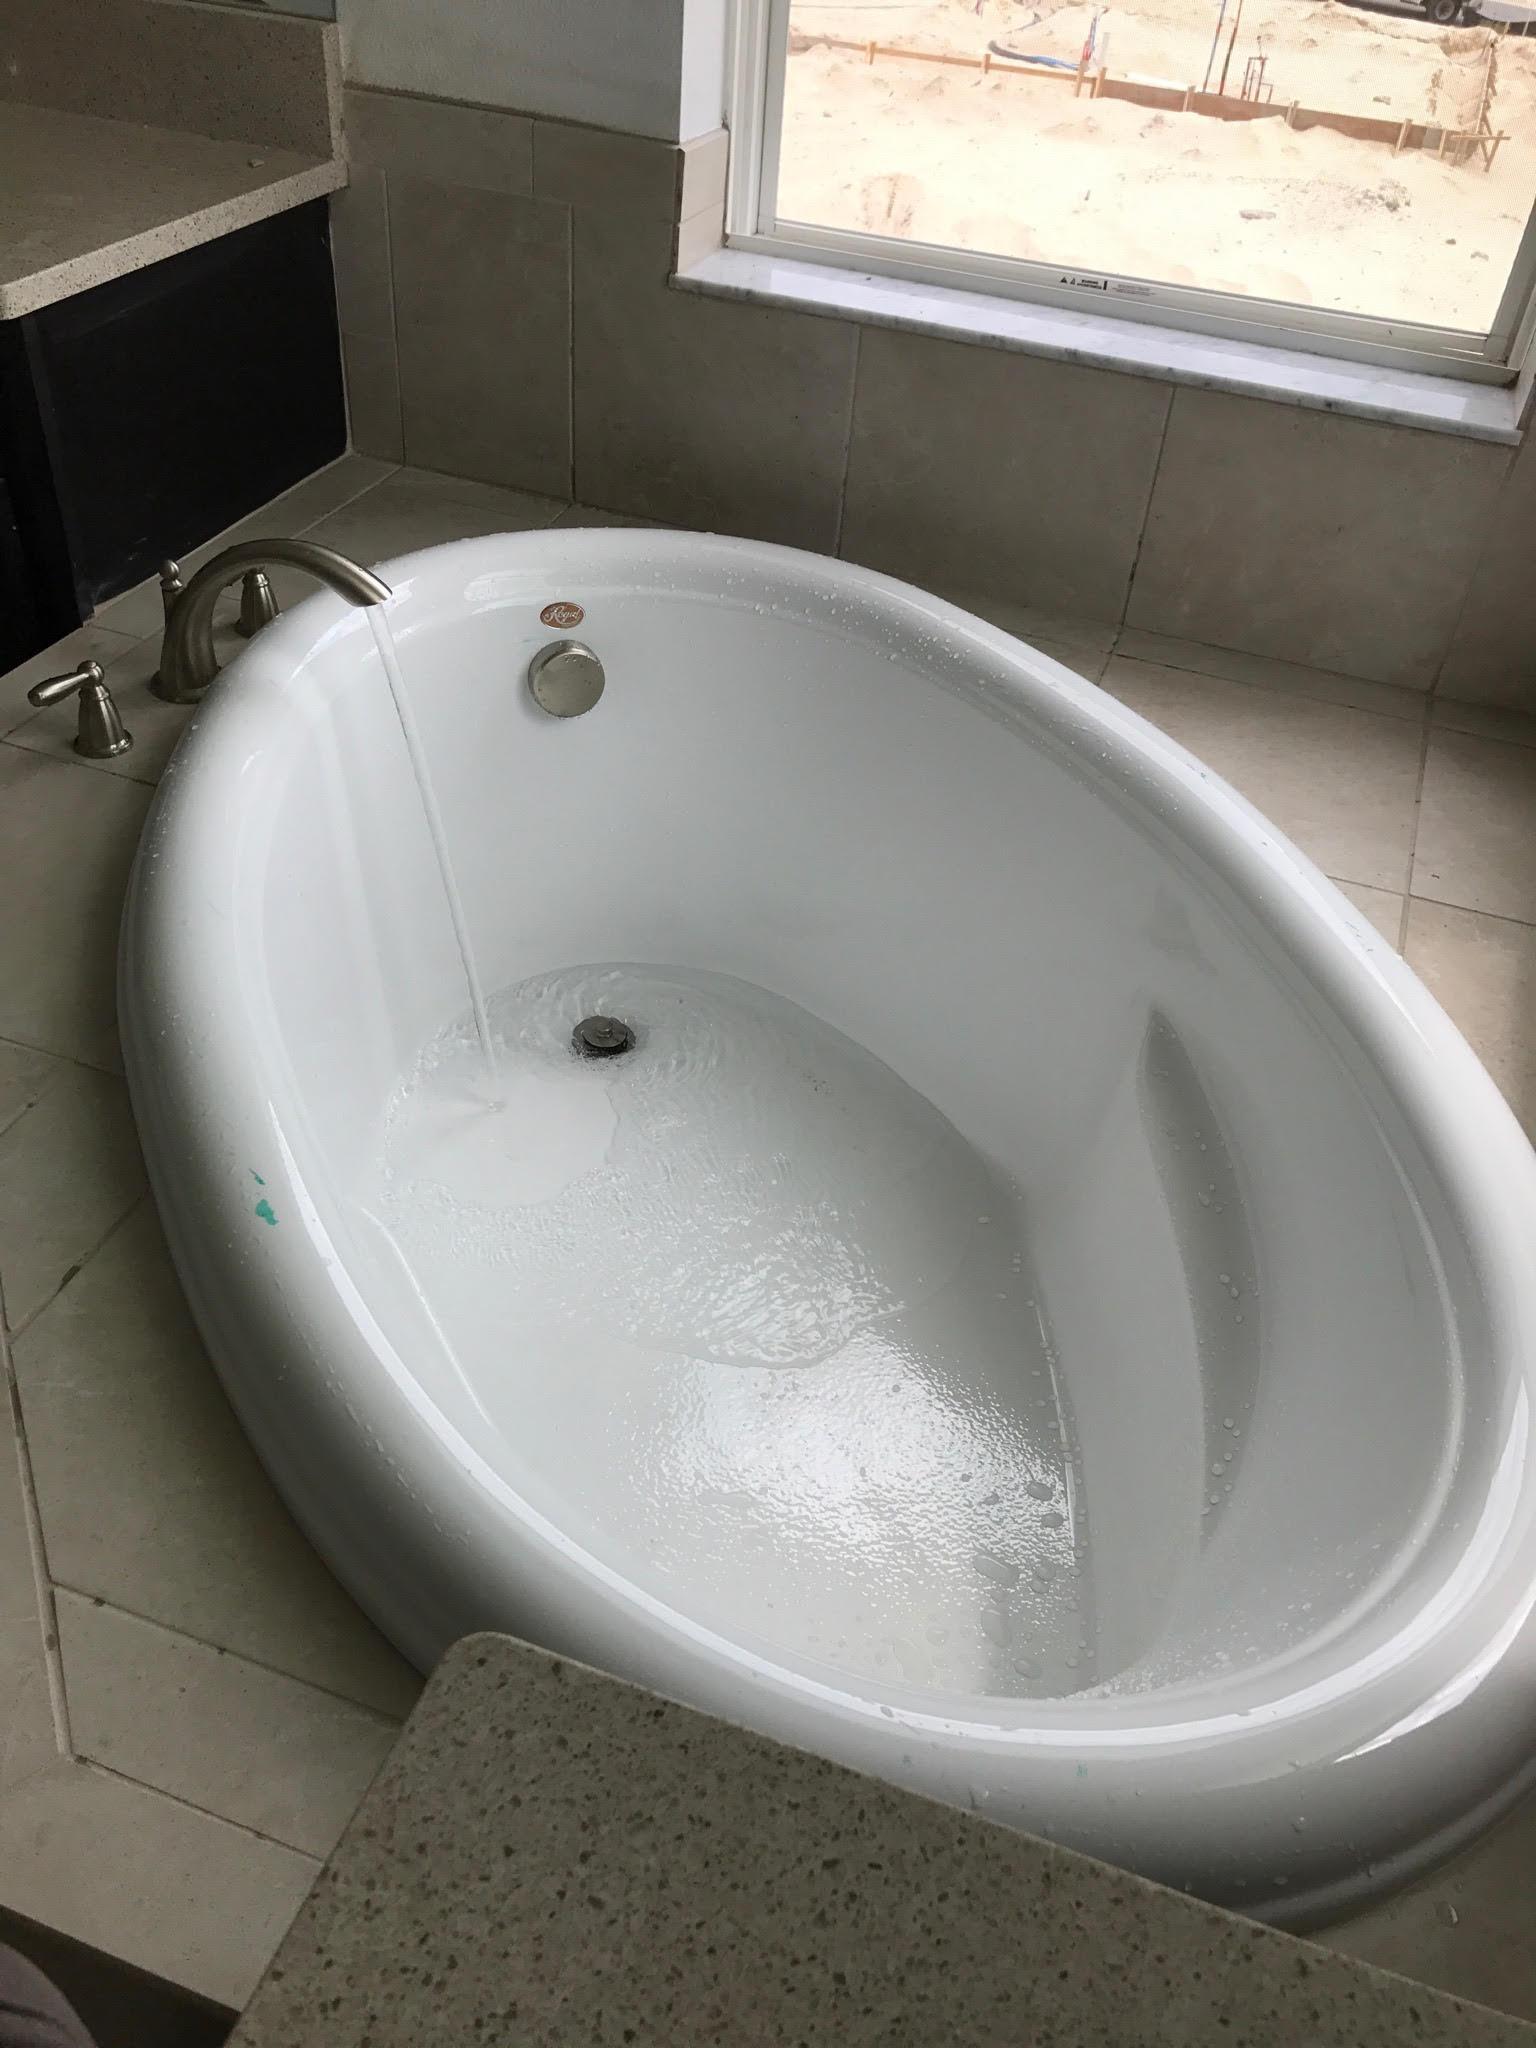 A-1 Southern Plumbing Bathtub Install